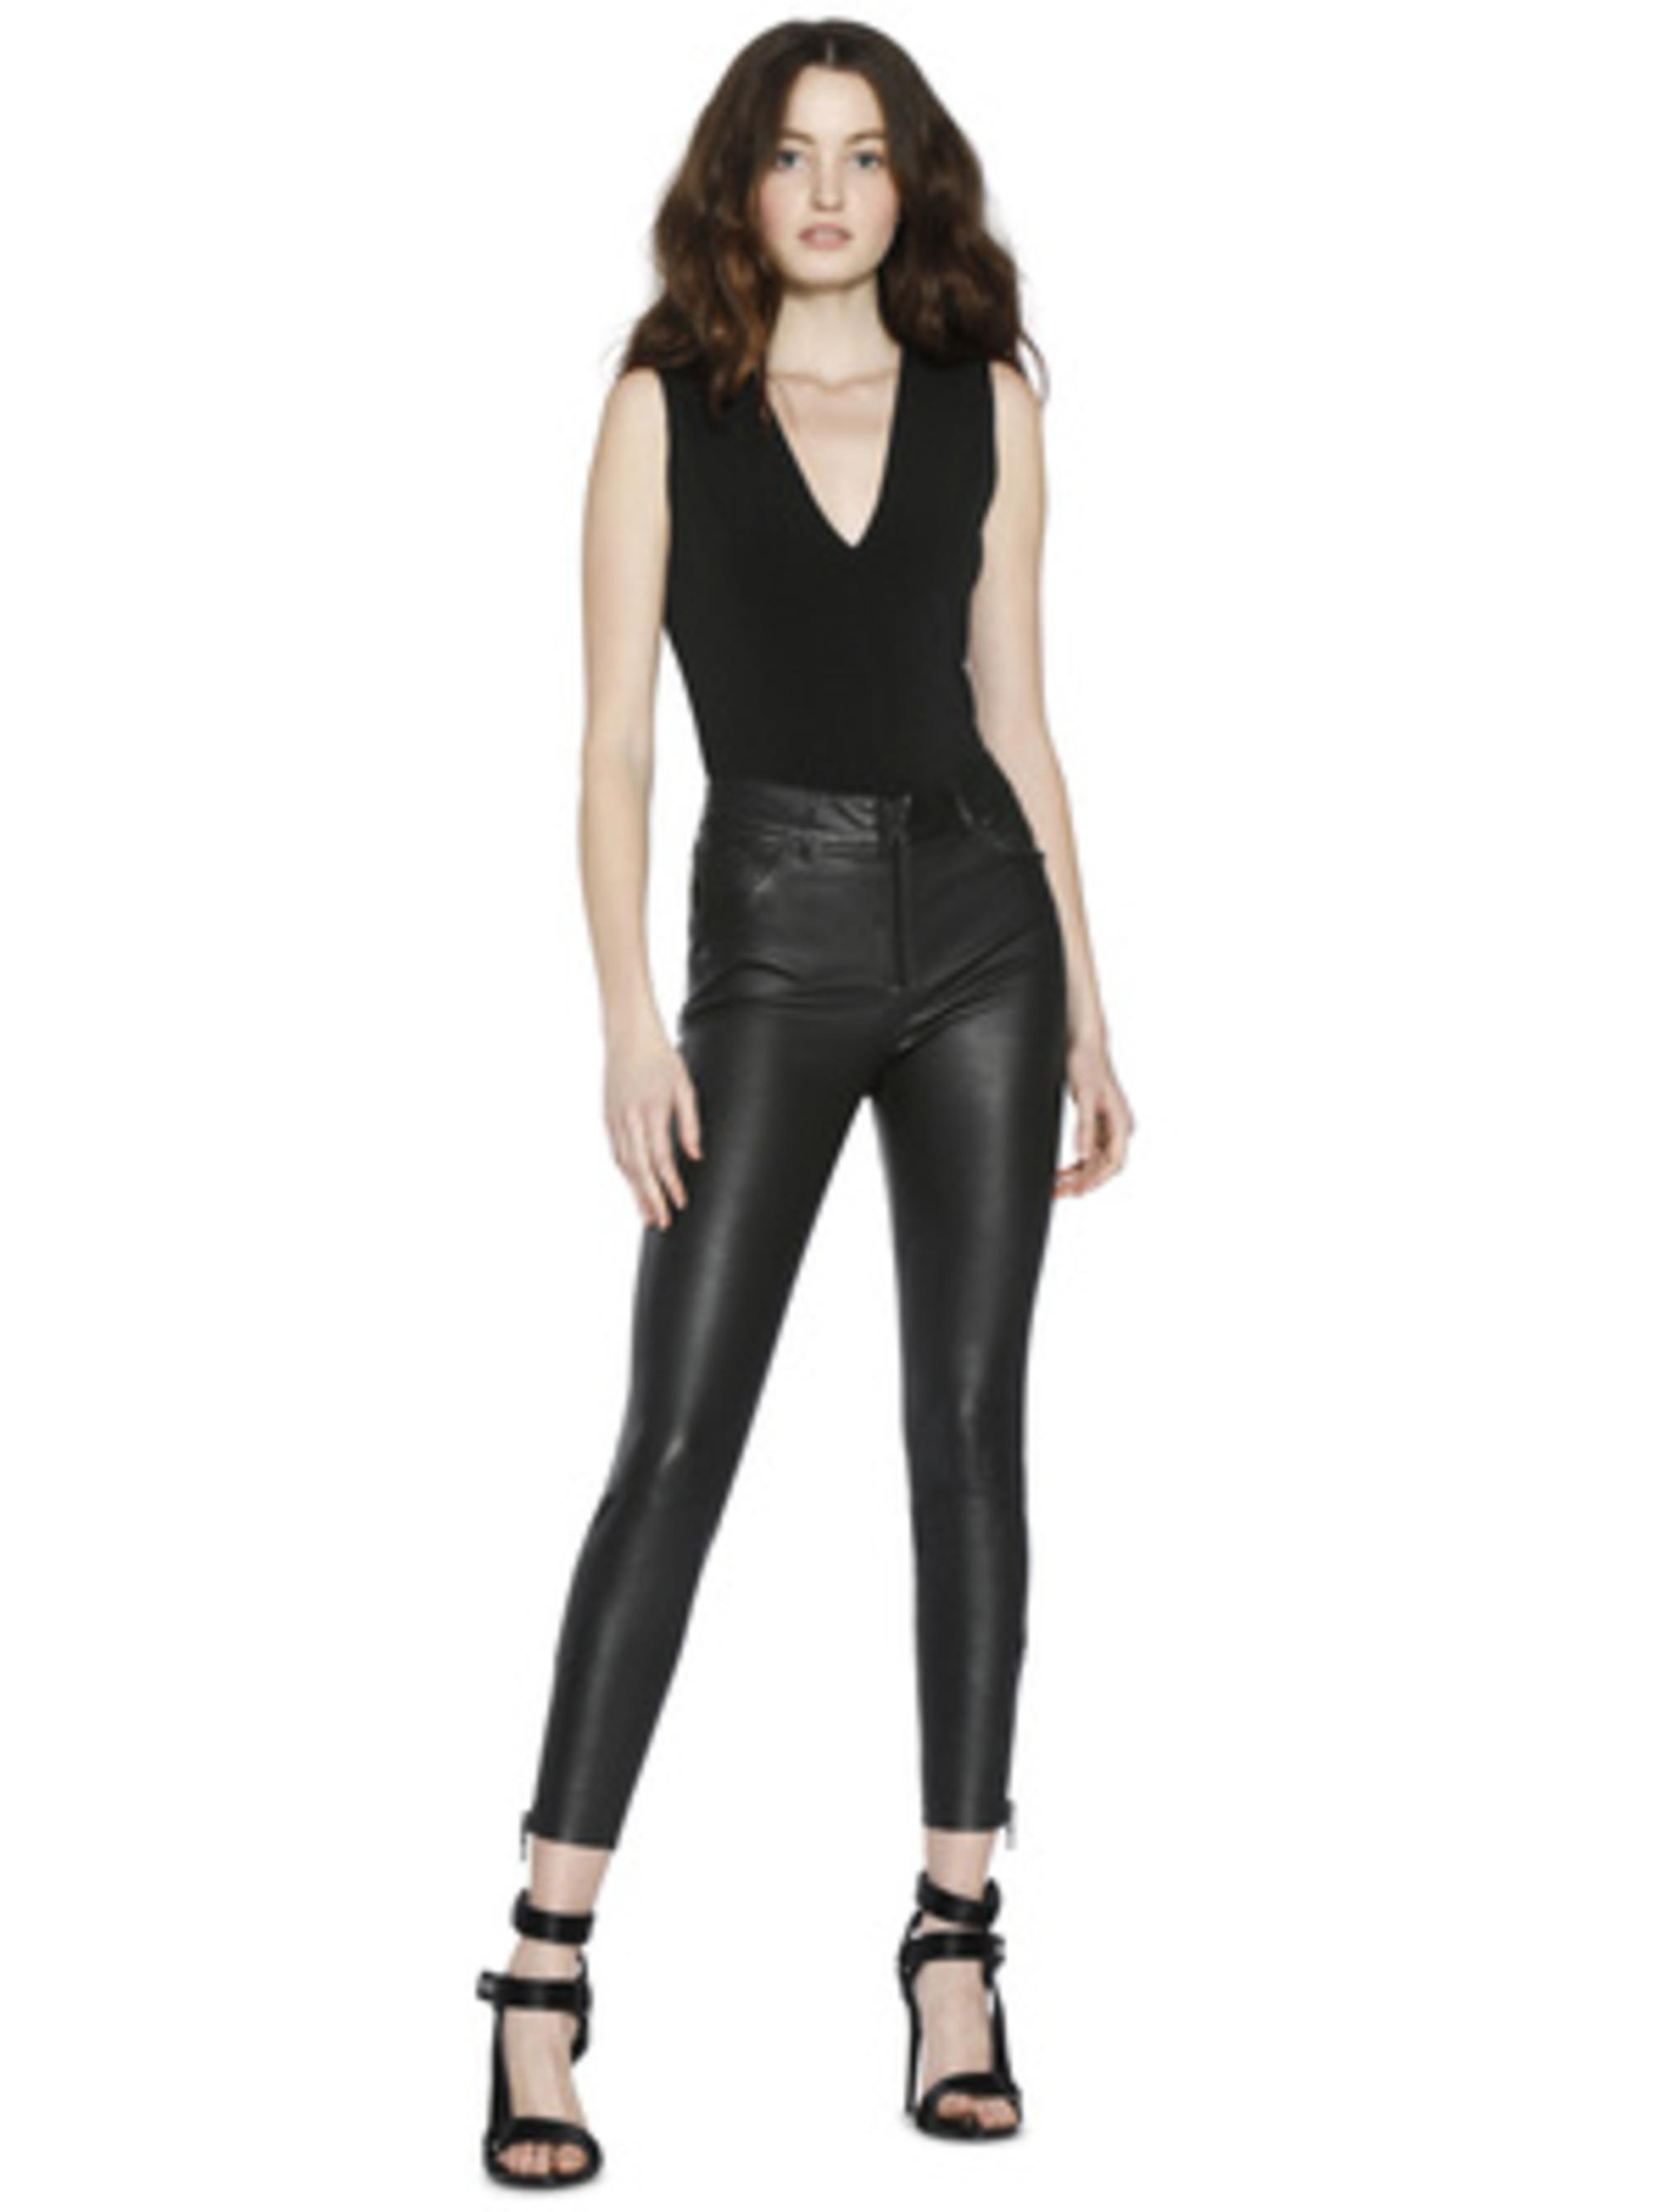 b32f8a4b913da Lyst - Alice + Olivia Marley Sleeveless Thong Bodysuit in Black